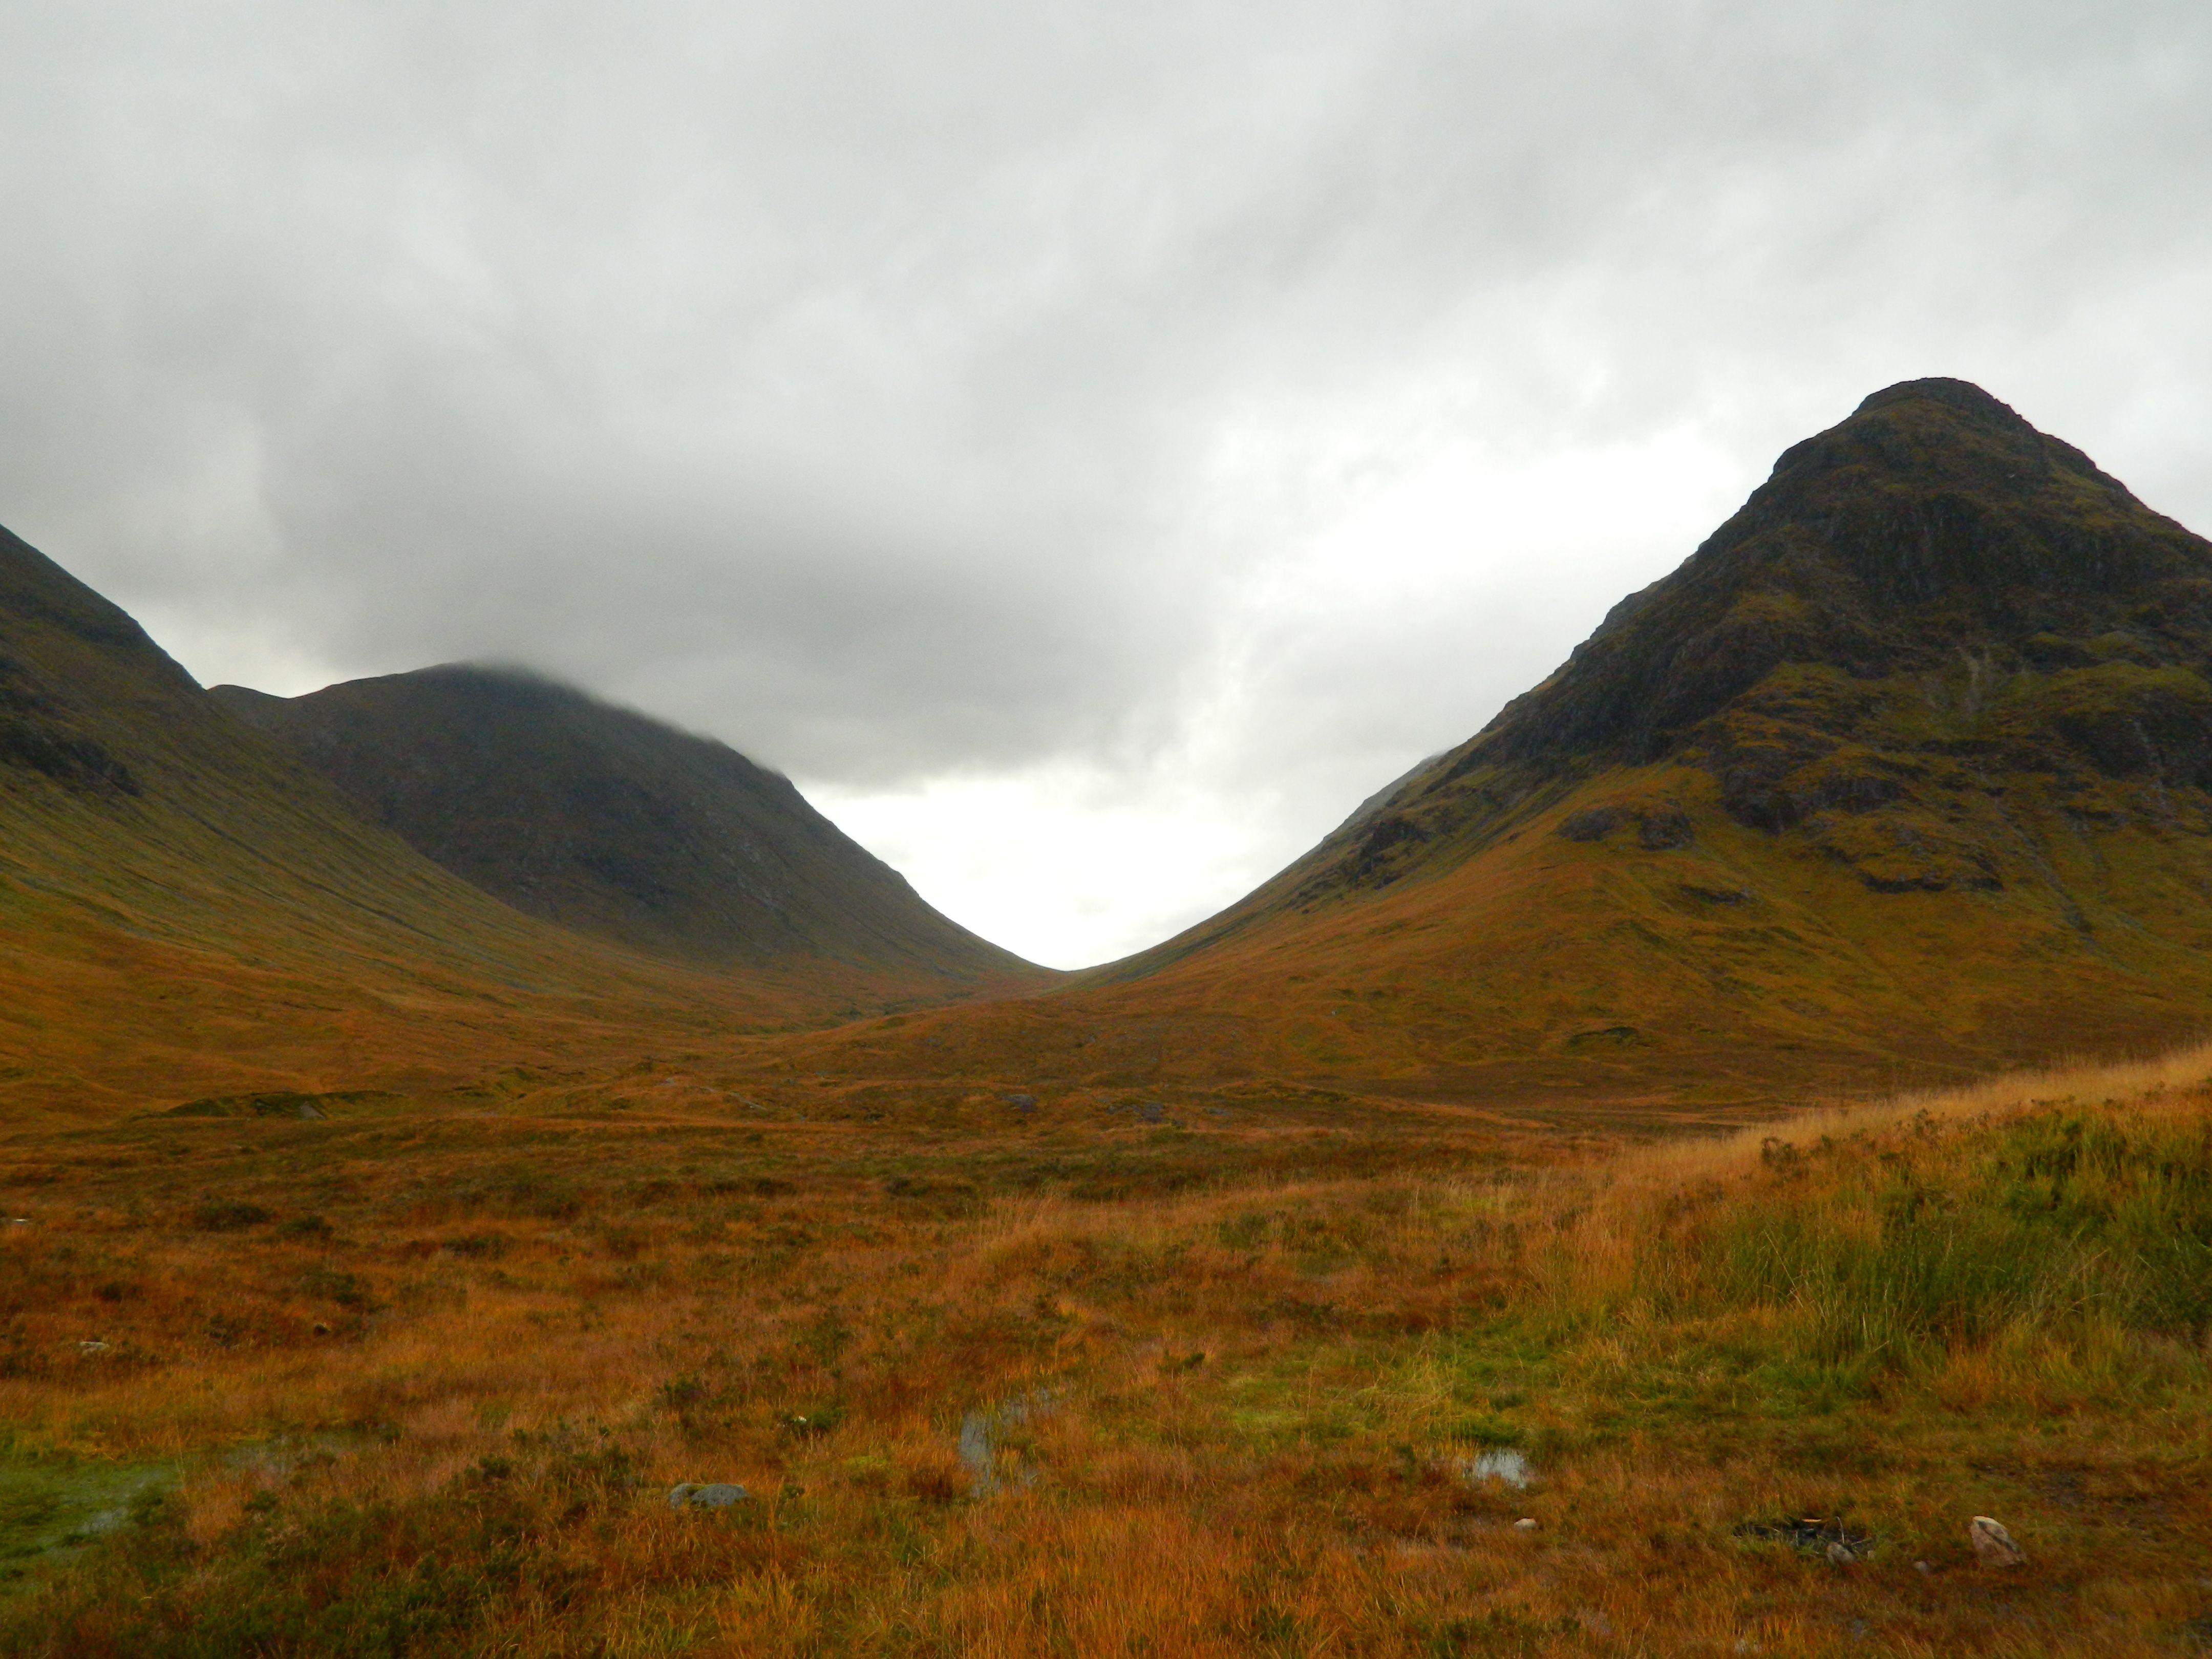 The Pass of Glencoe, Scotland